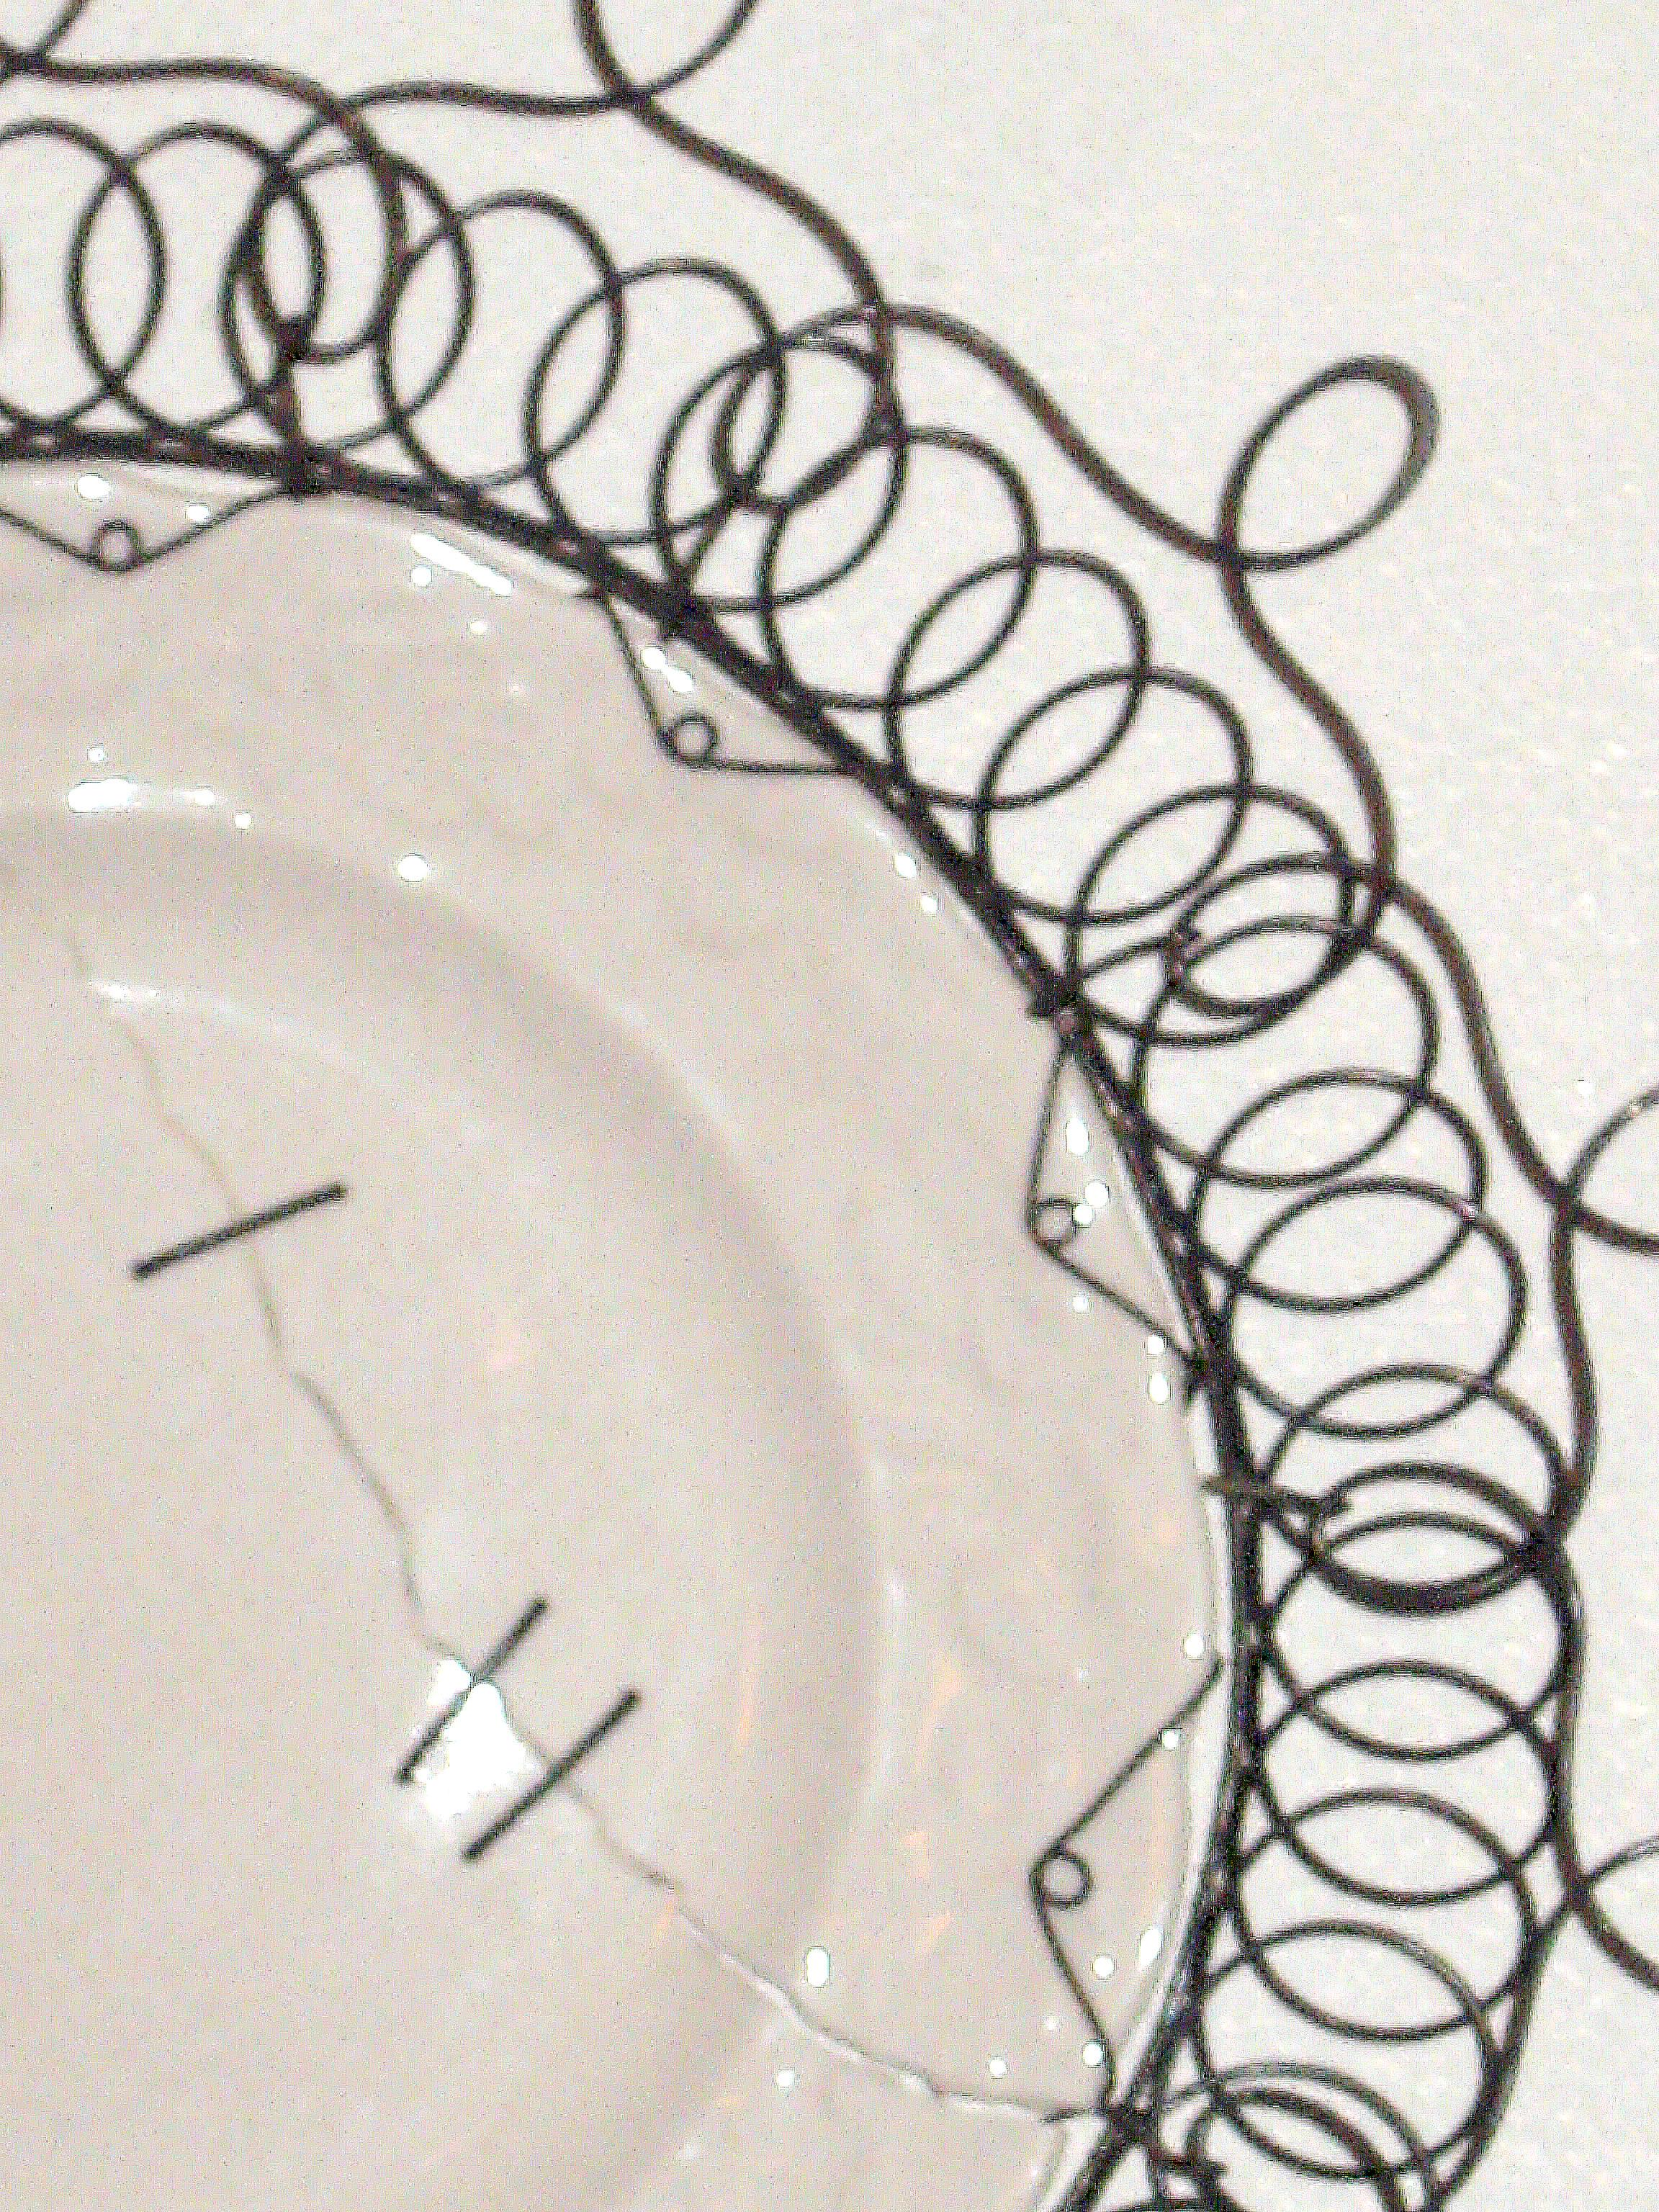 Rehabilitation Plate - Curly